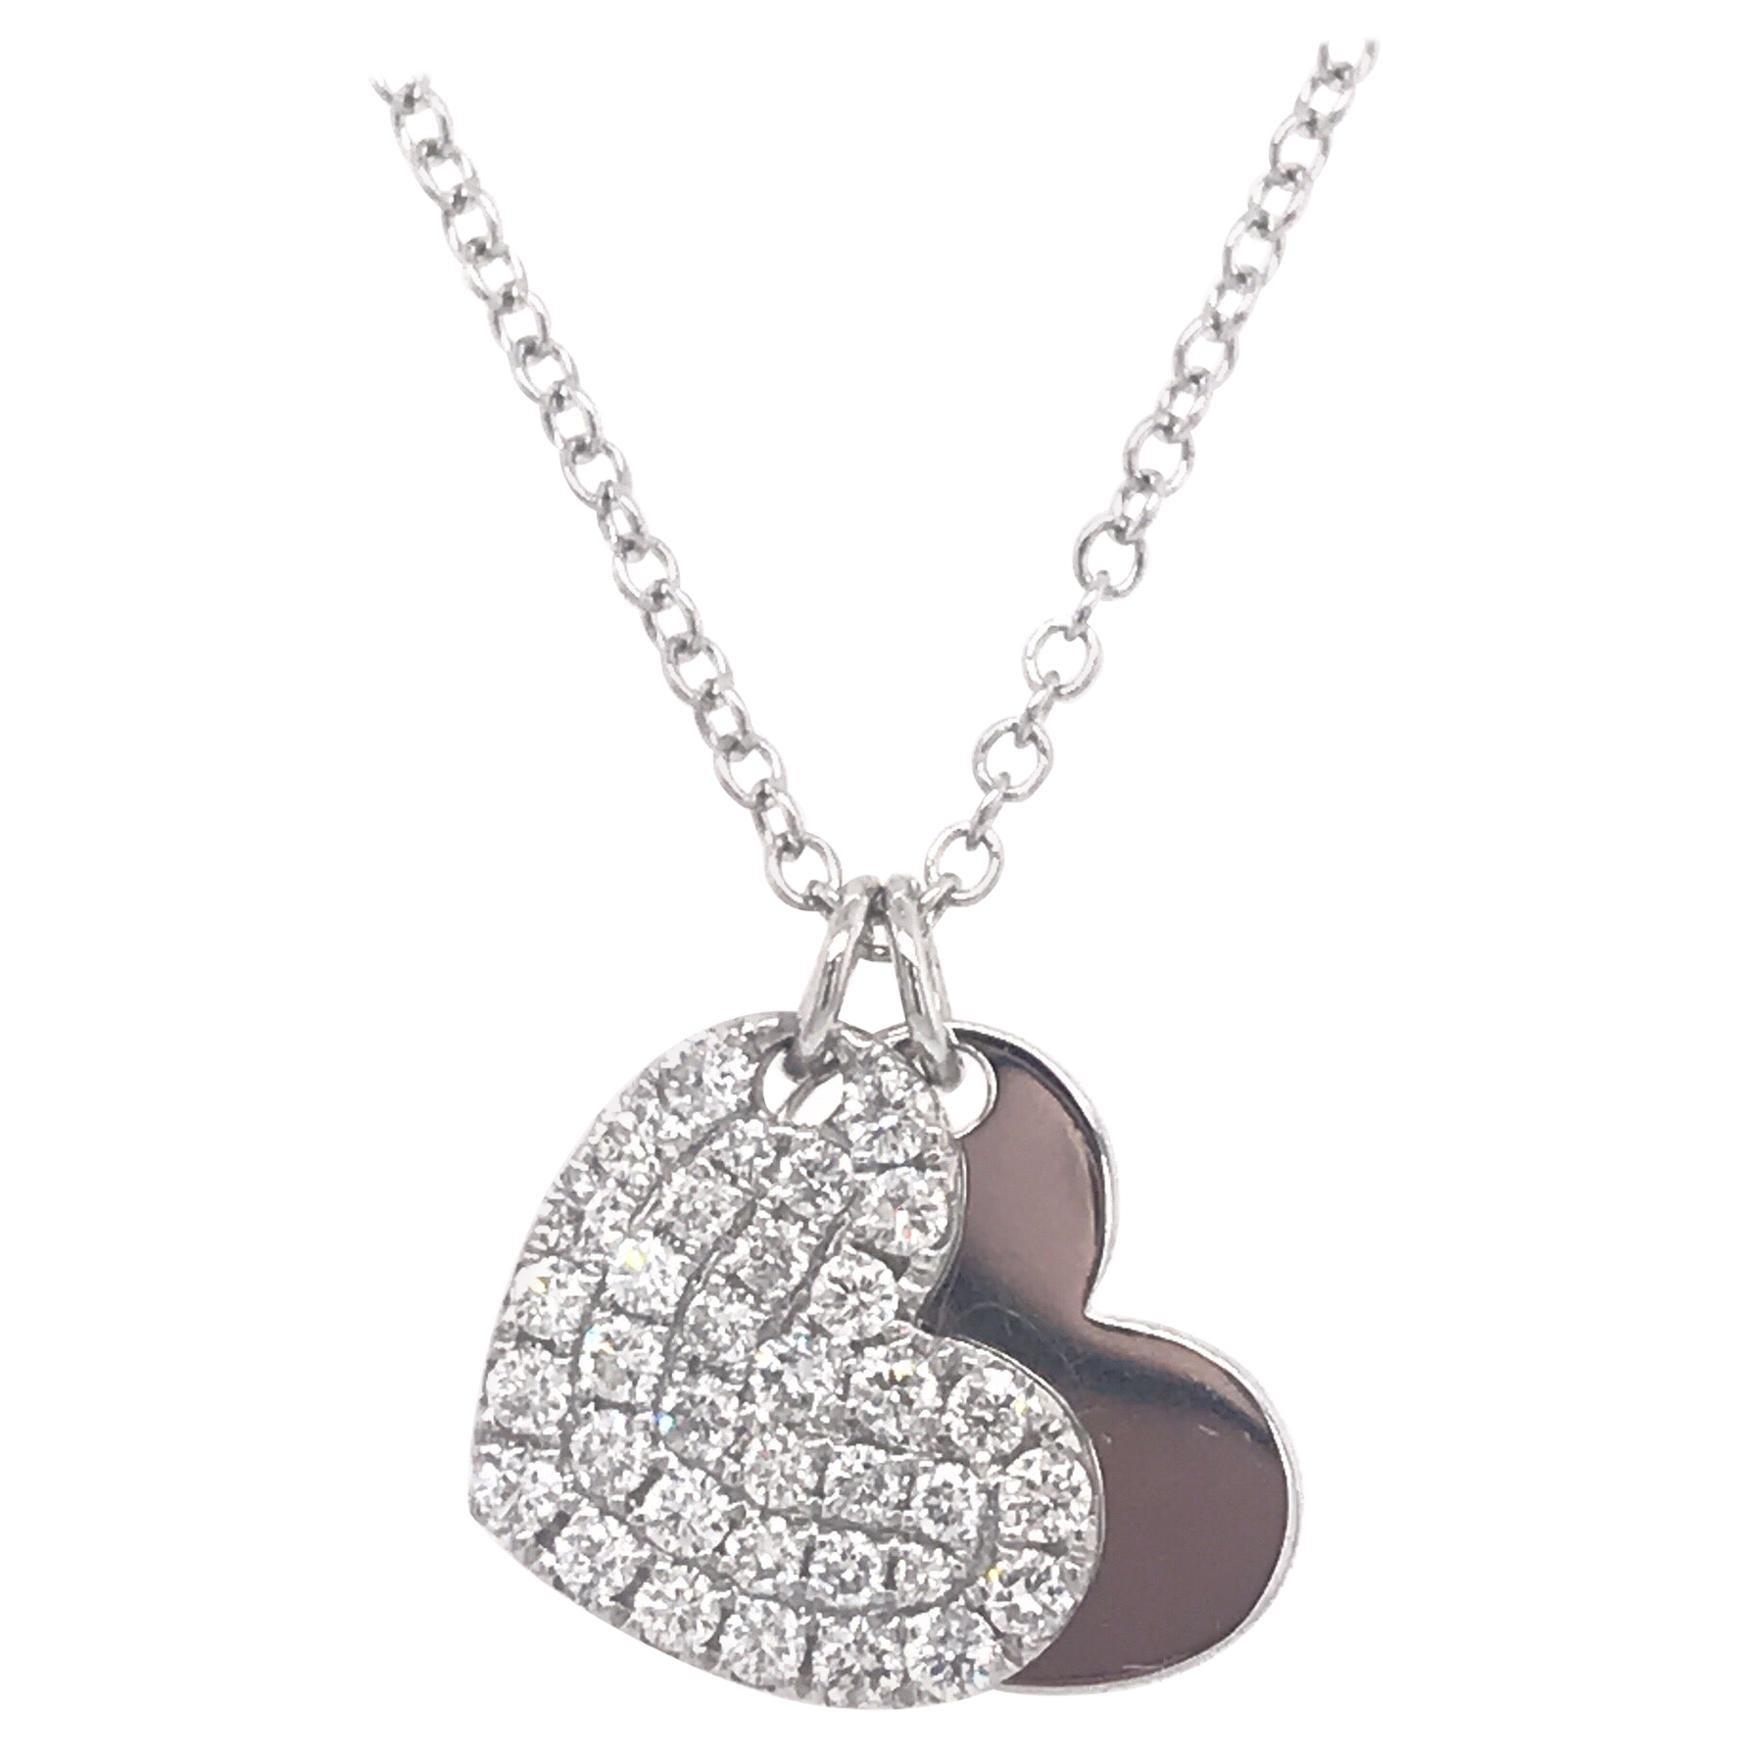 Double Heart Diamond Pendant Necklace 0.52 Carat 18 Karat White Gold